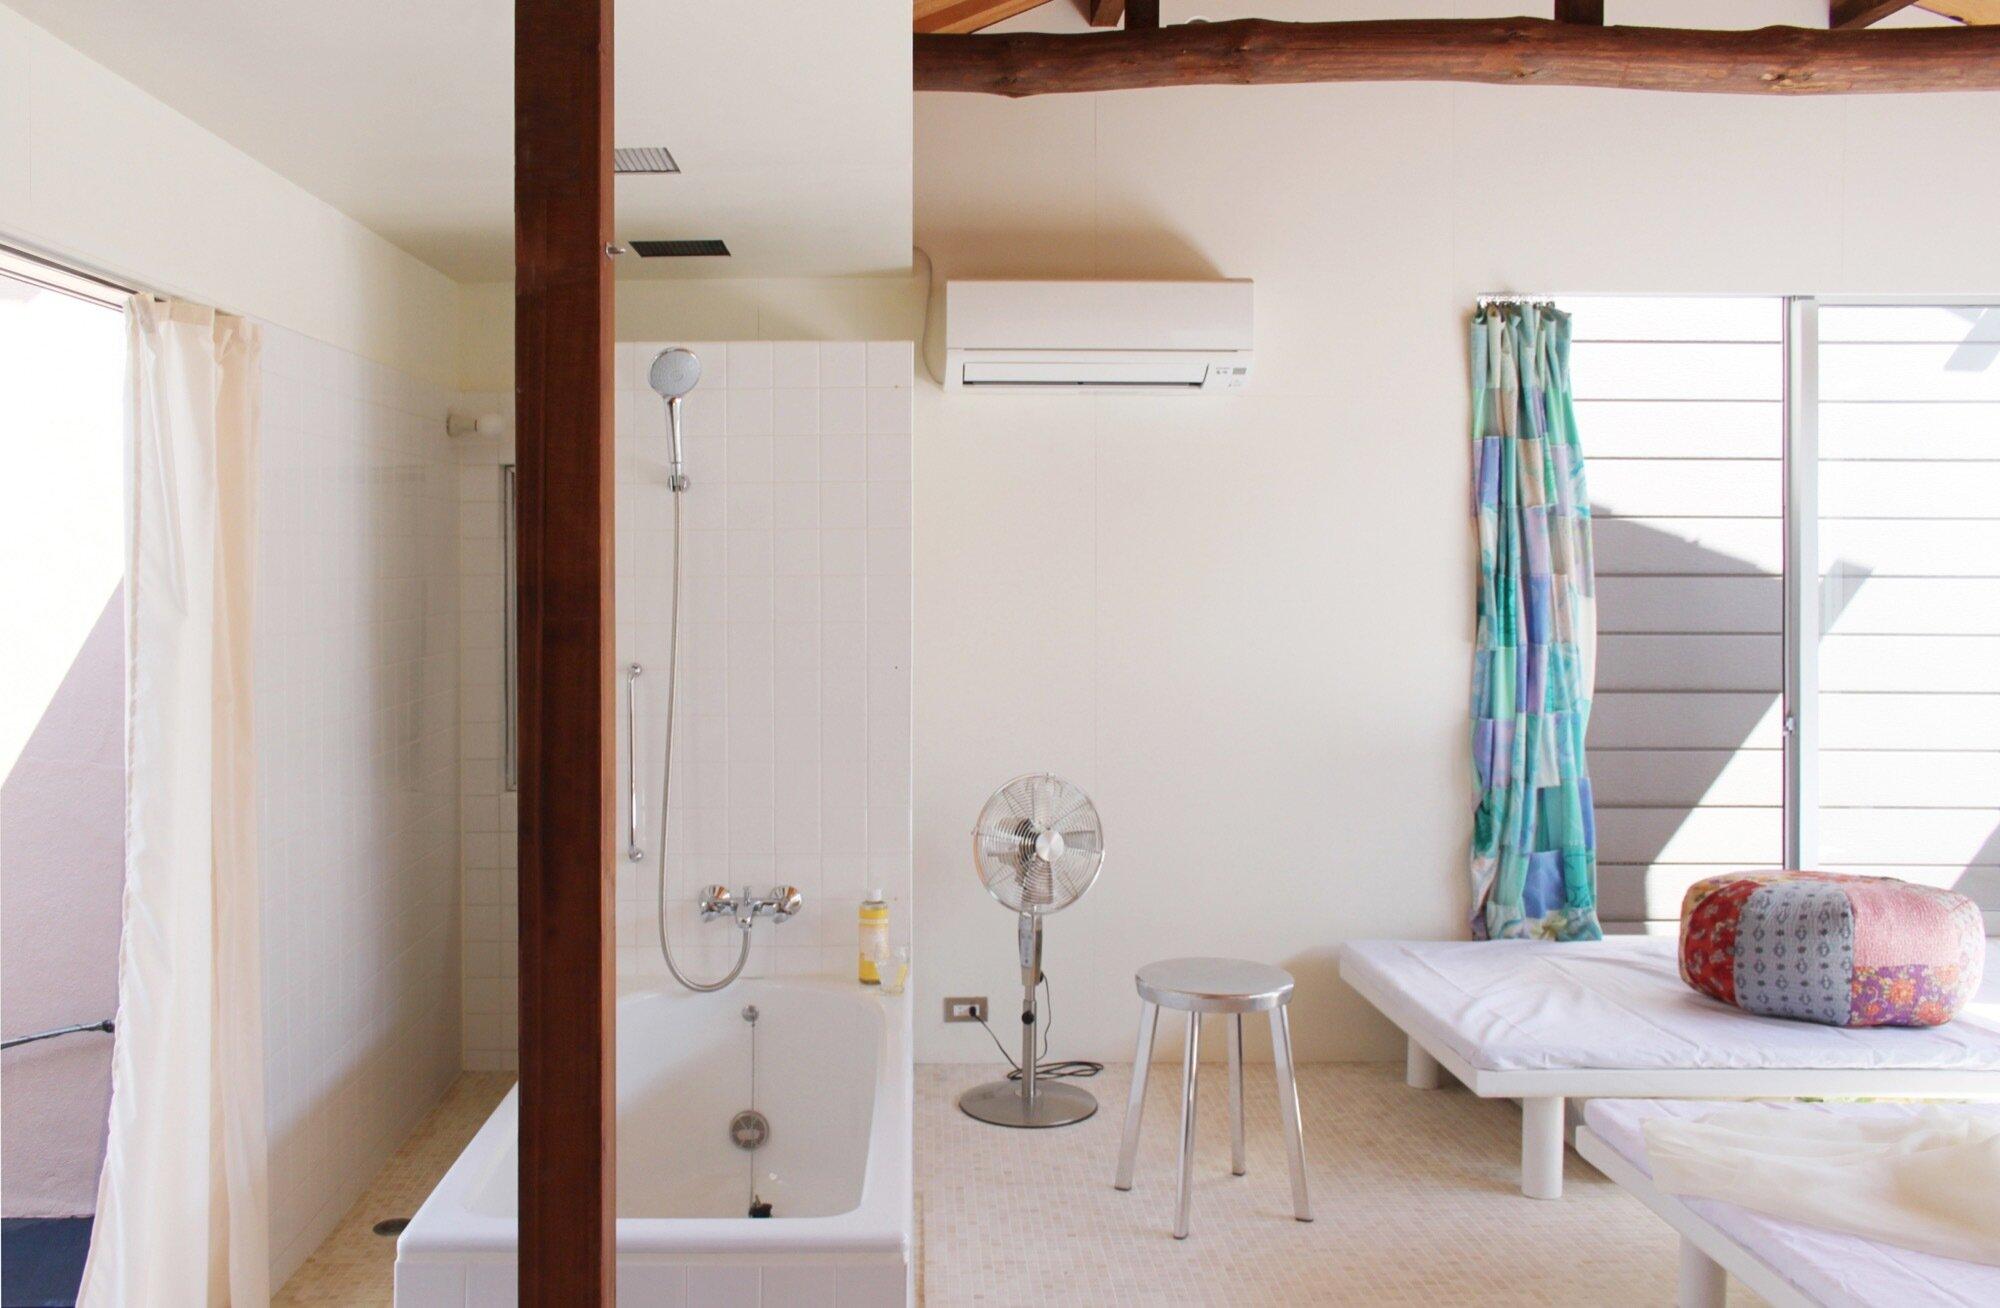 CASA O - Takahashi Ippei Office - Tokyo Japan - Bathroom - Humble Homes